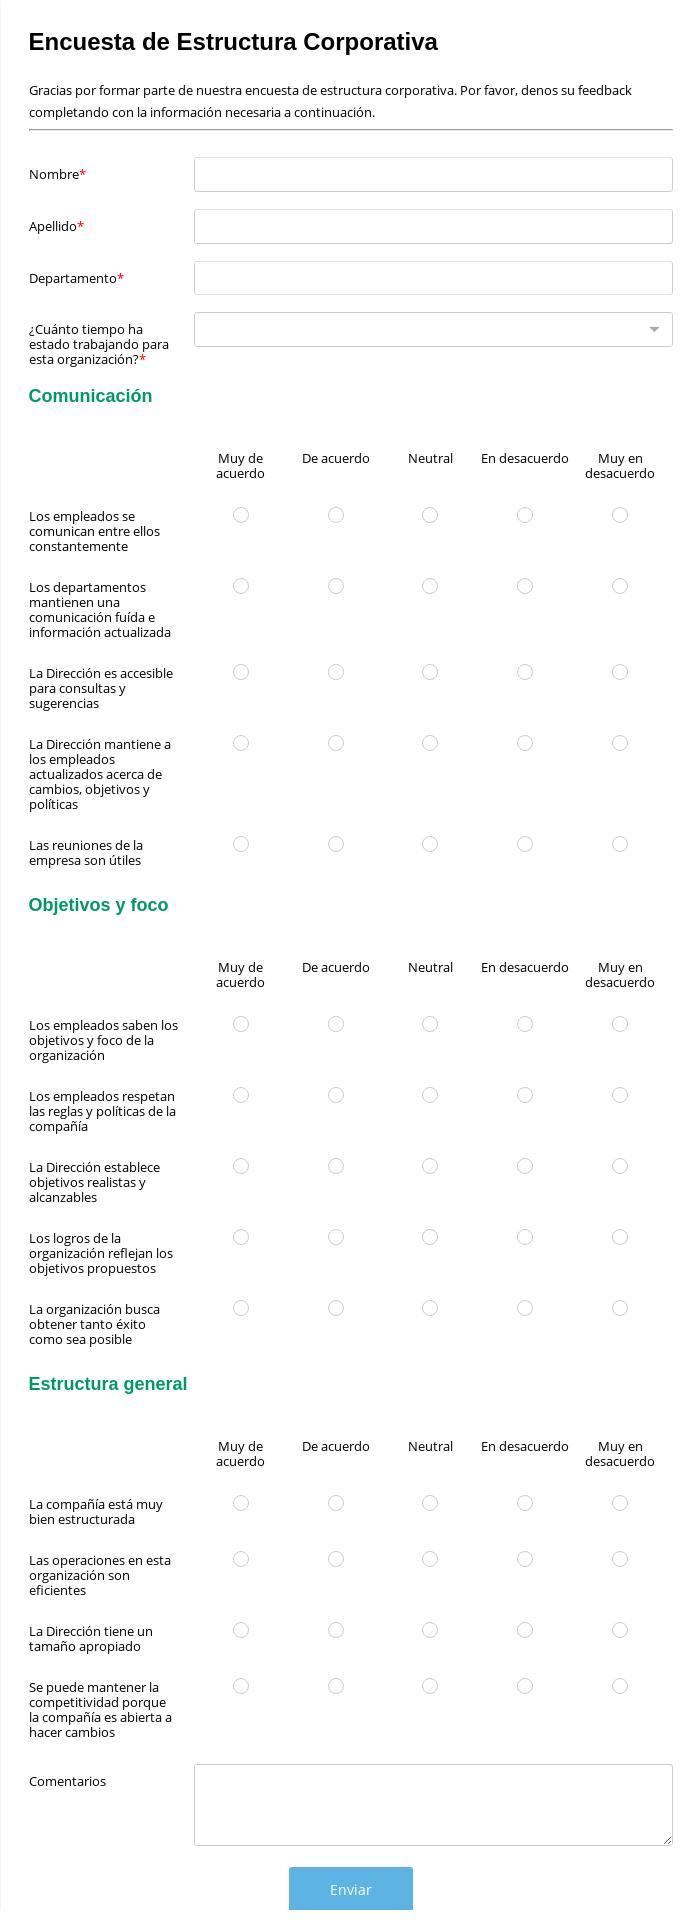 Encuesta de Estructura Corporativa